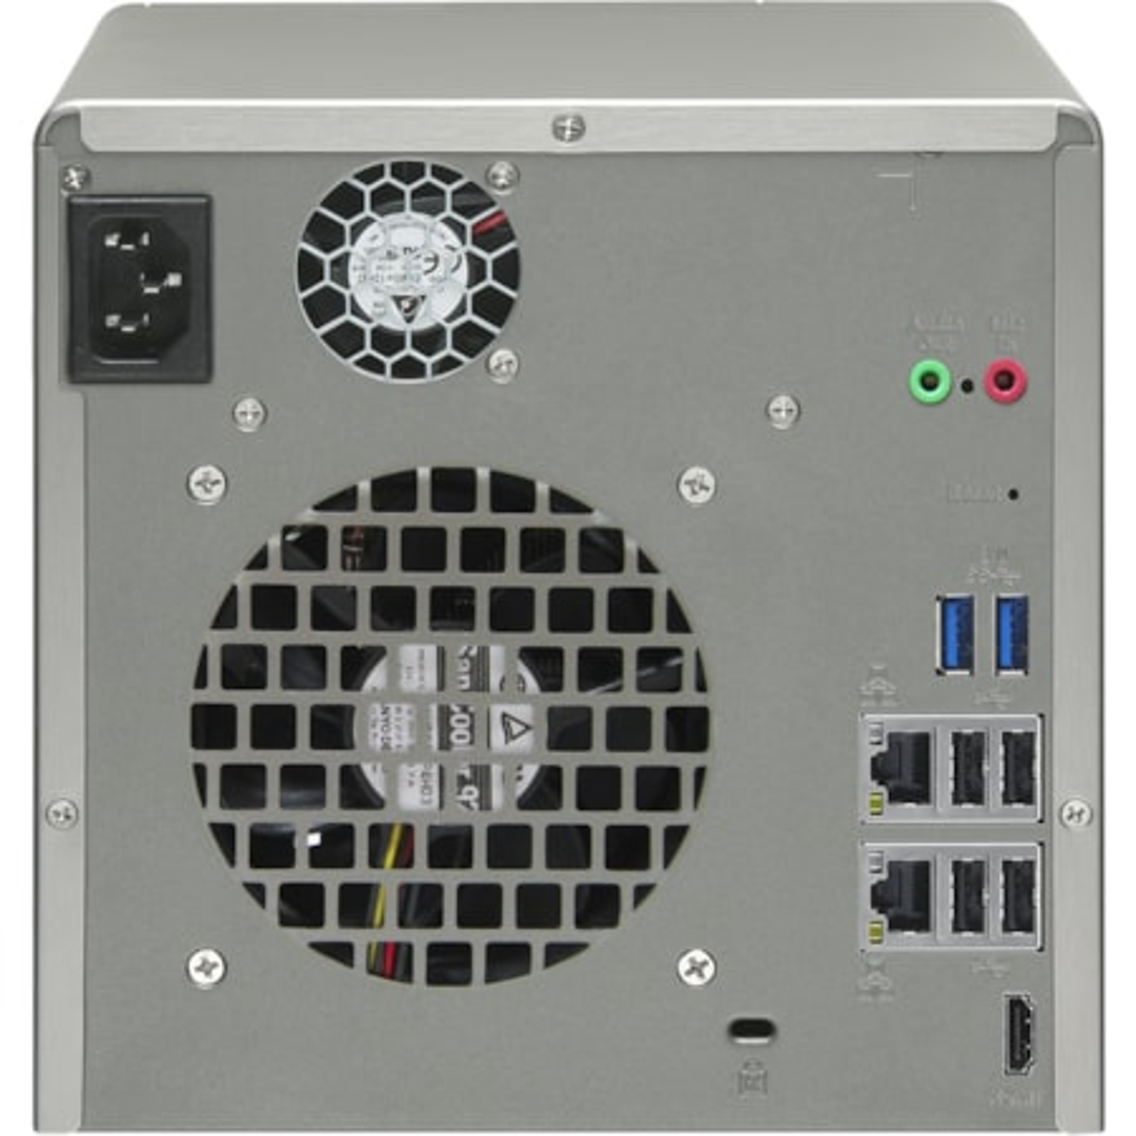 QNAP VioStor VS-4108-PRO+ Video Surveillance Station